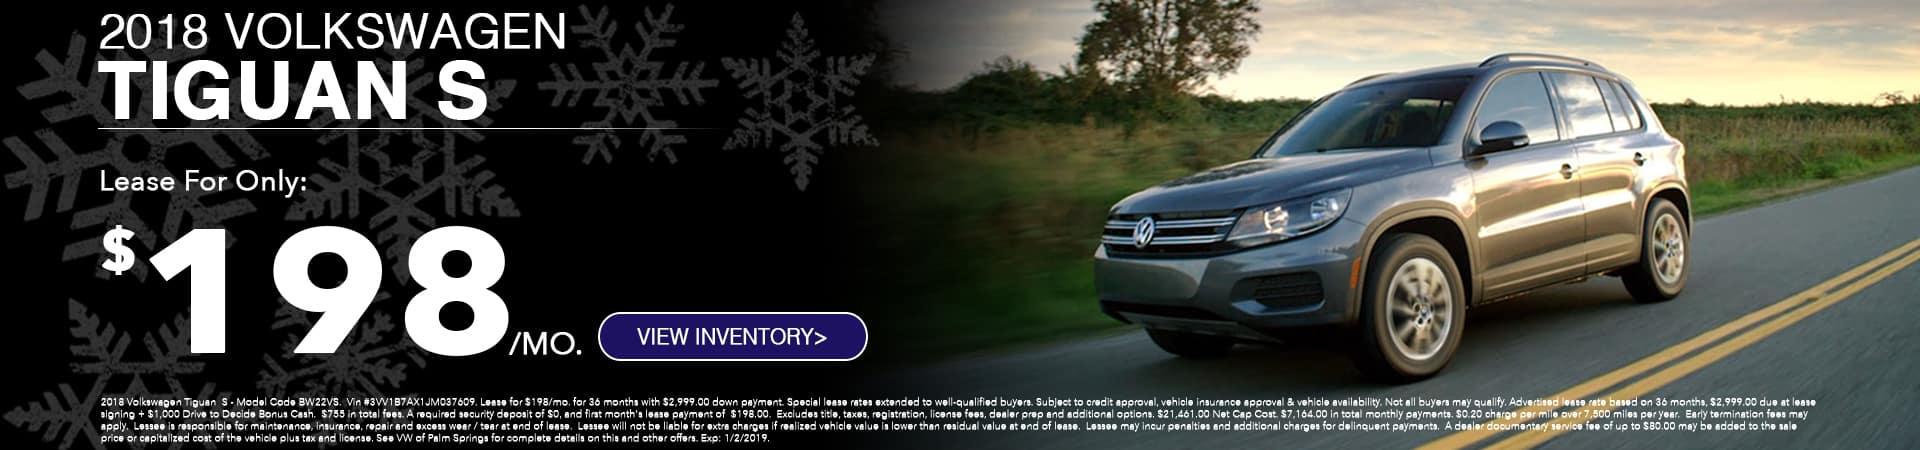 VW Tiguan December Special